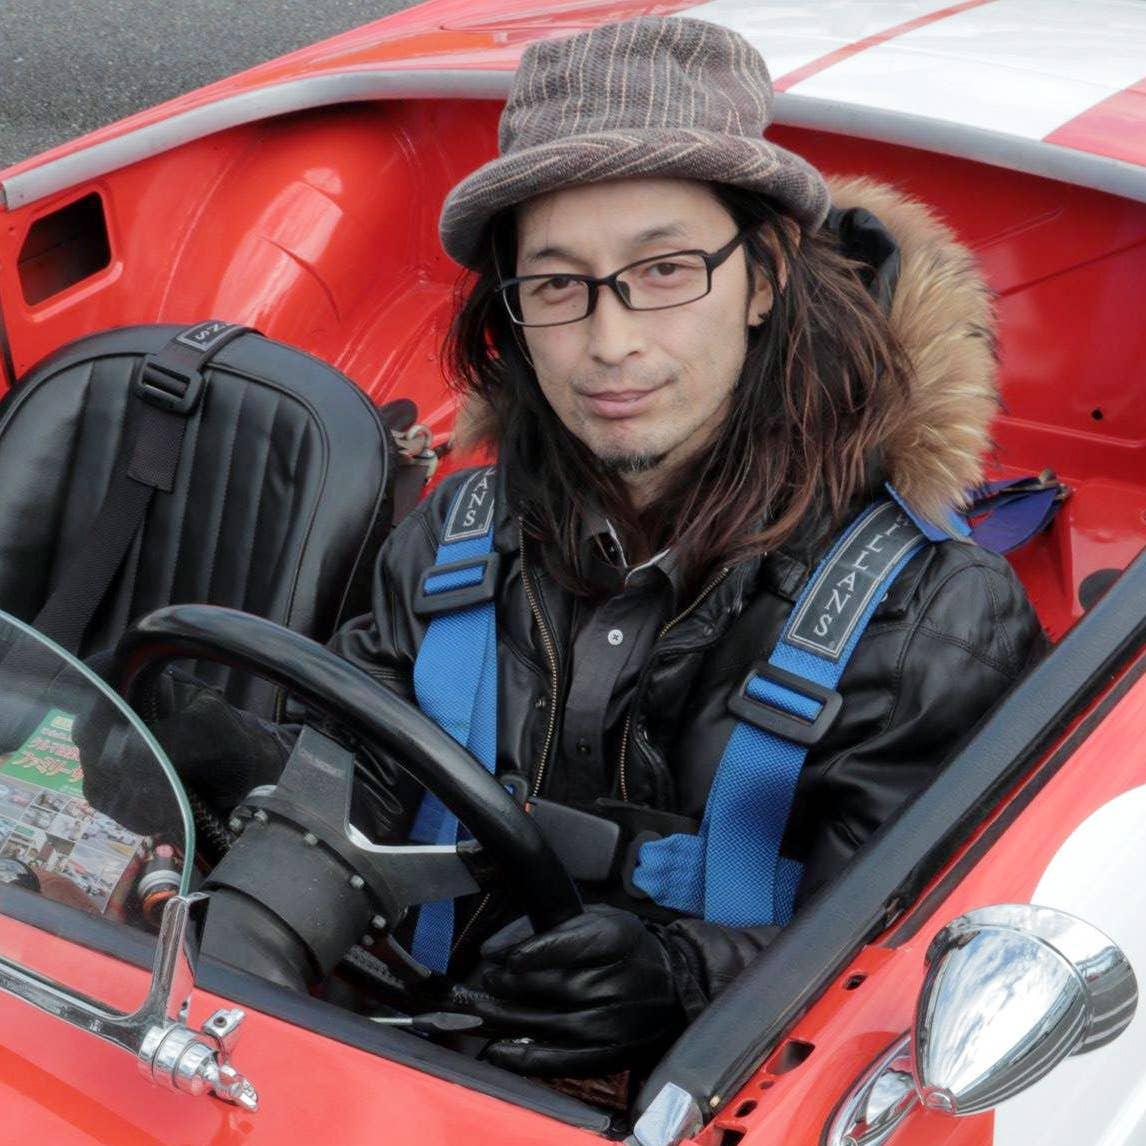 ユダ会長(Naoki Watanabe)